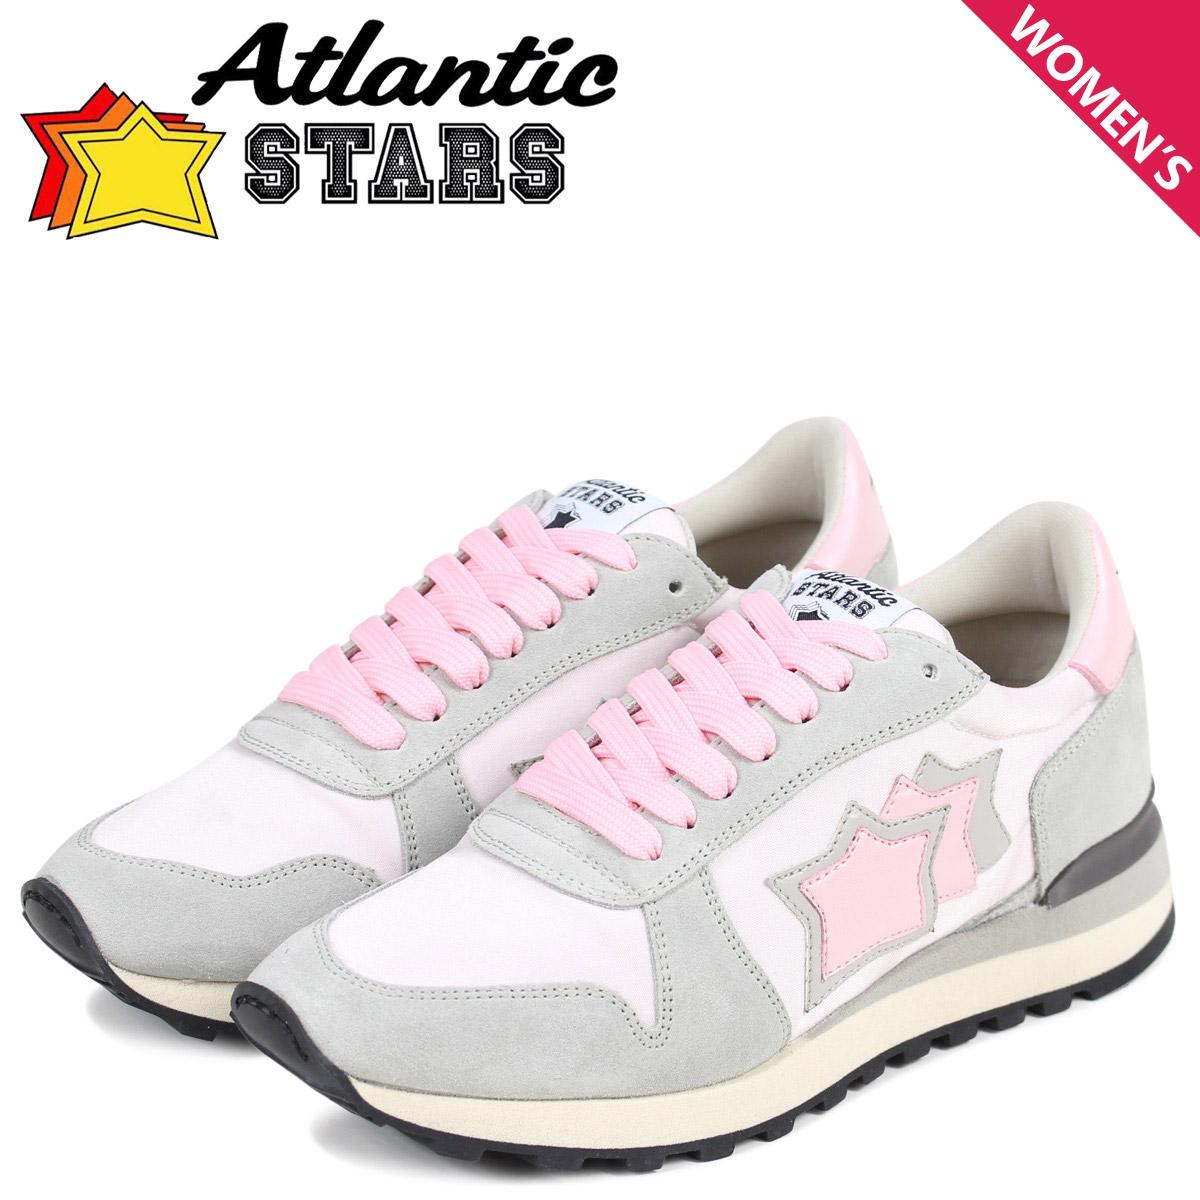 Atlantic STARS アトランティックスターズ レディース スニーカー ベガ VEGA RBNYNPGAE ピンク